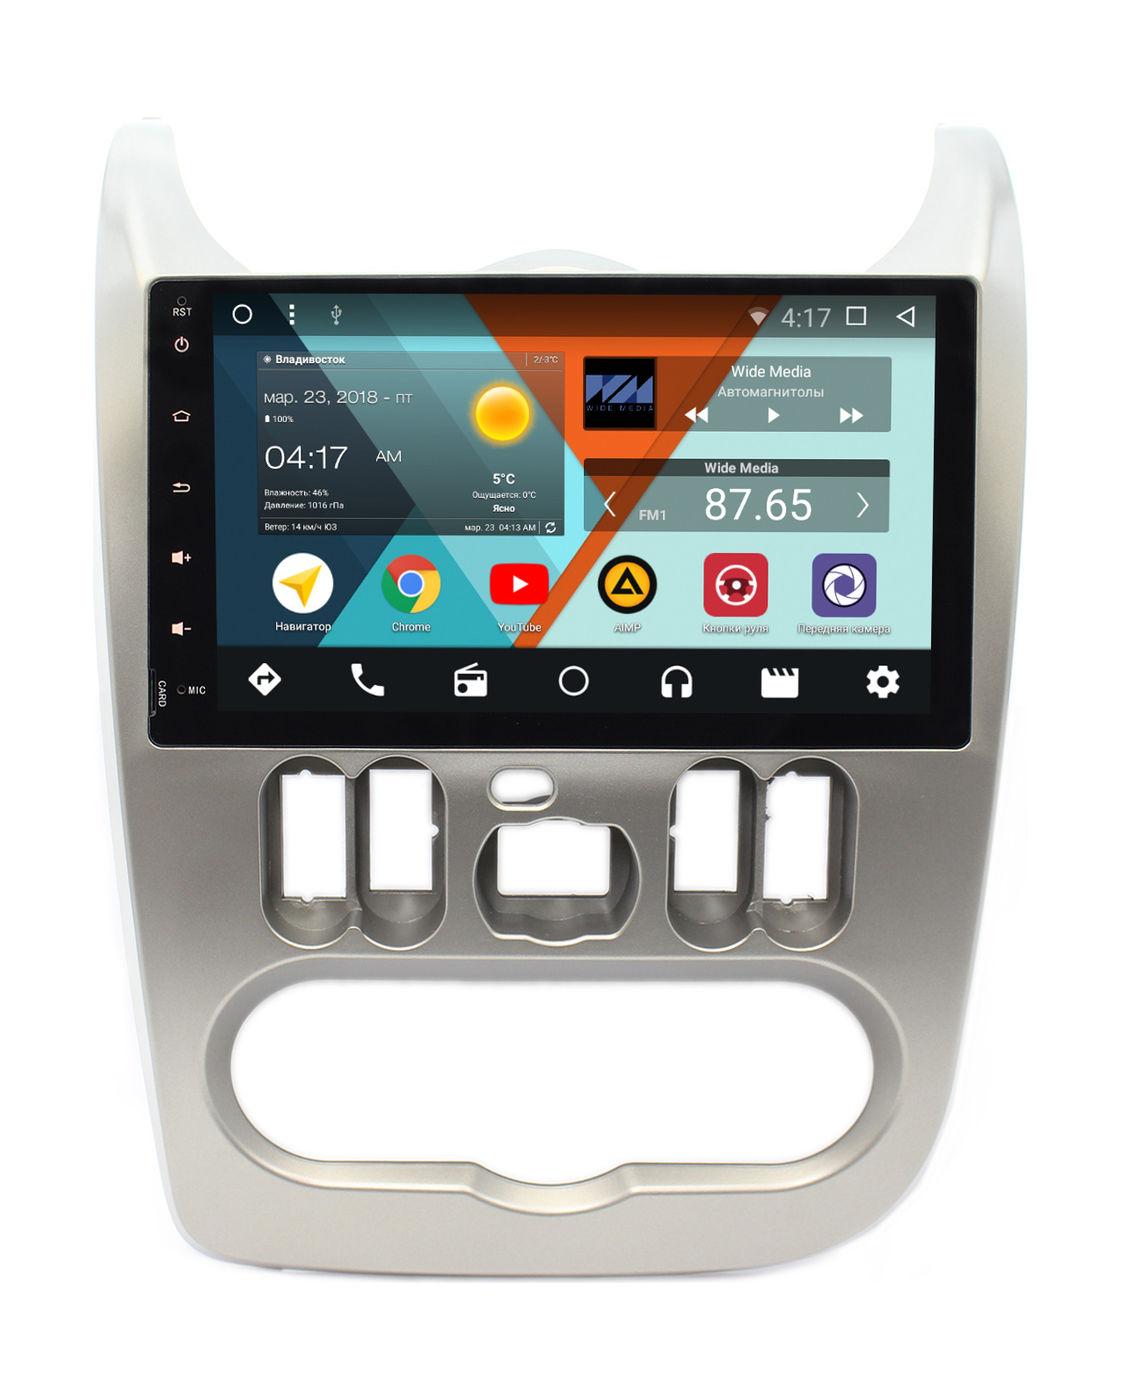 Штатная магнитола Wide Media WM-VS7A706NB-RP-RNLG-48 для Renault Logan I, Sandero I 2009-2014 Android 7.1.2 цена